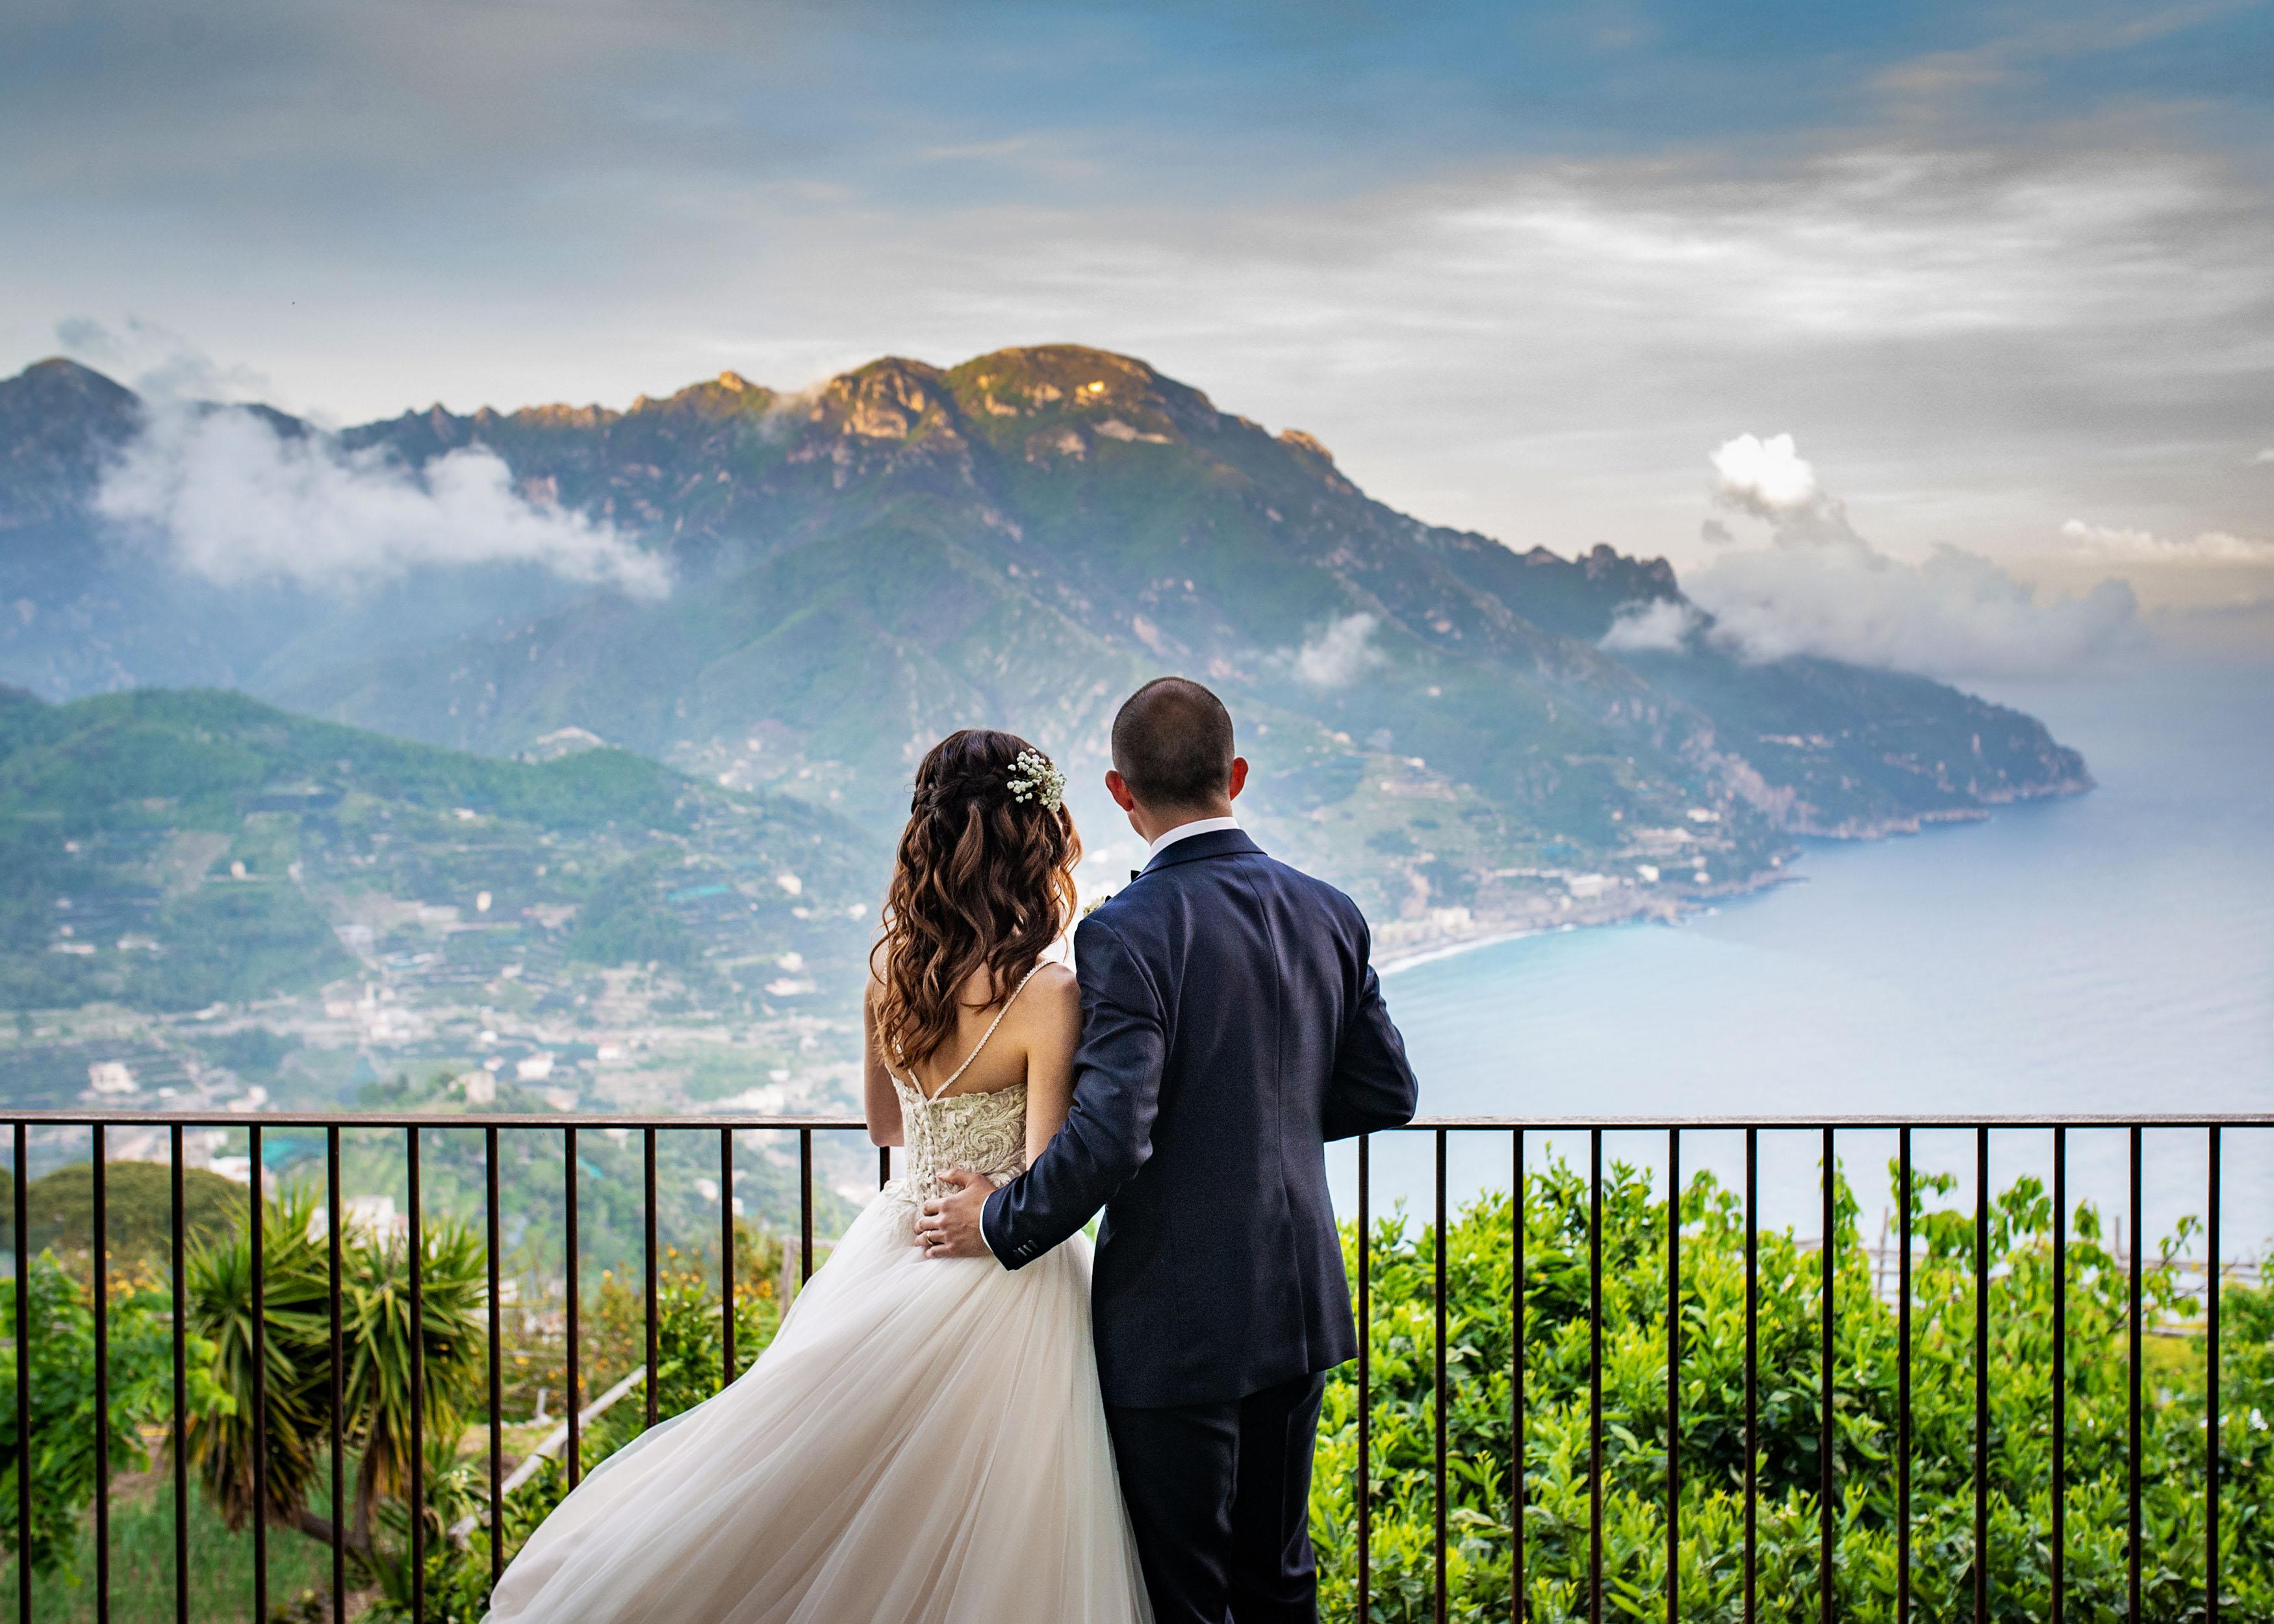 http://www.weddingamalfi.com/wp-content/uploads/Katia-Jorge-18-maggio-2019-36.jpg